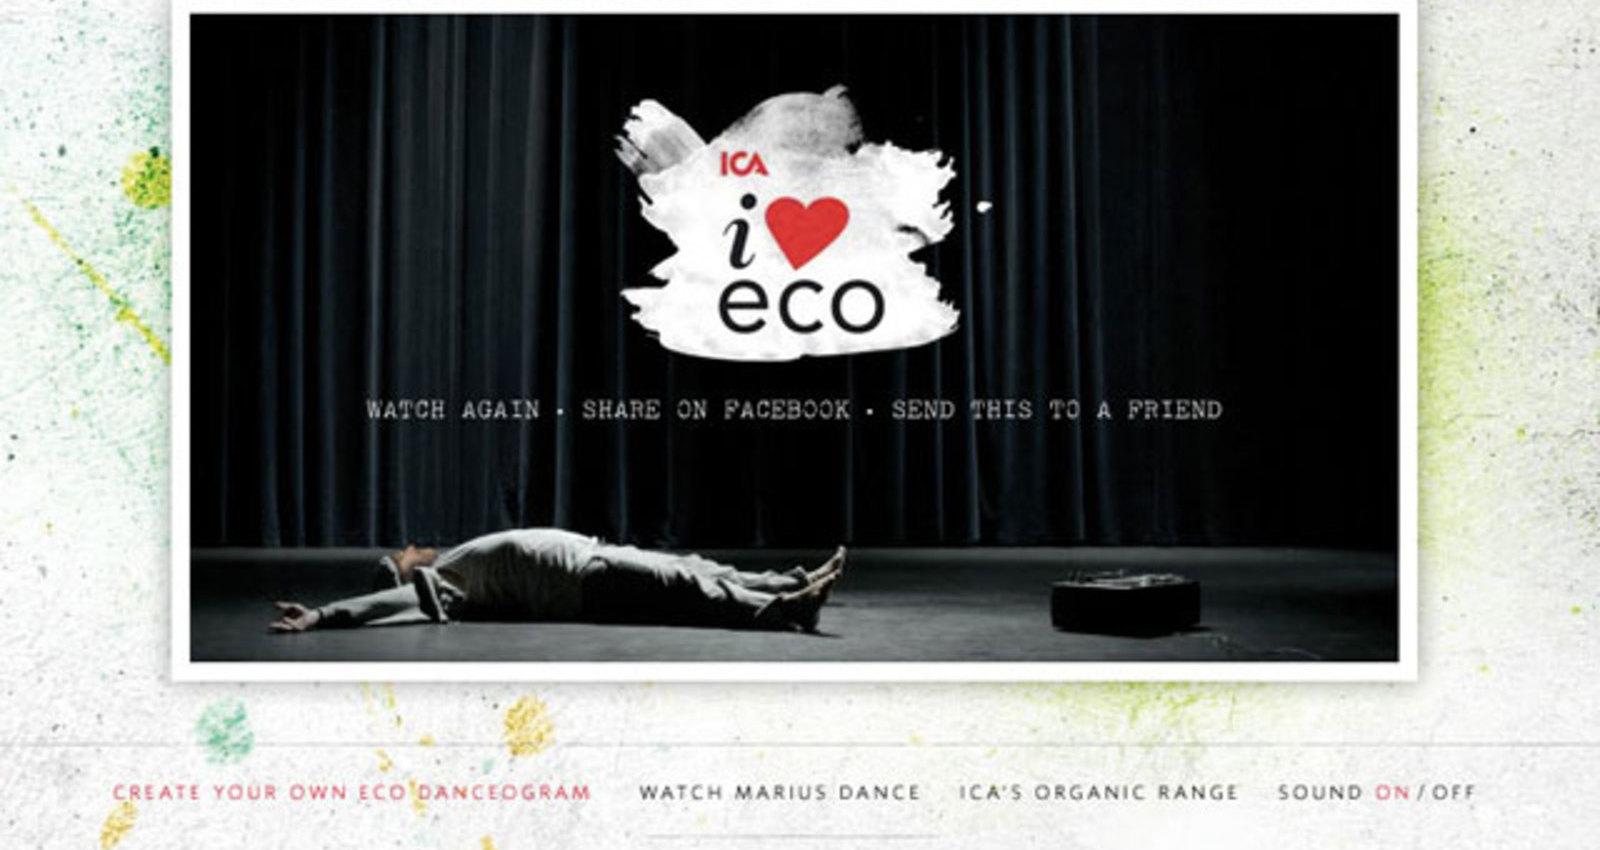 The Eco Dance